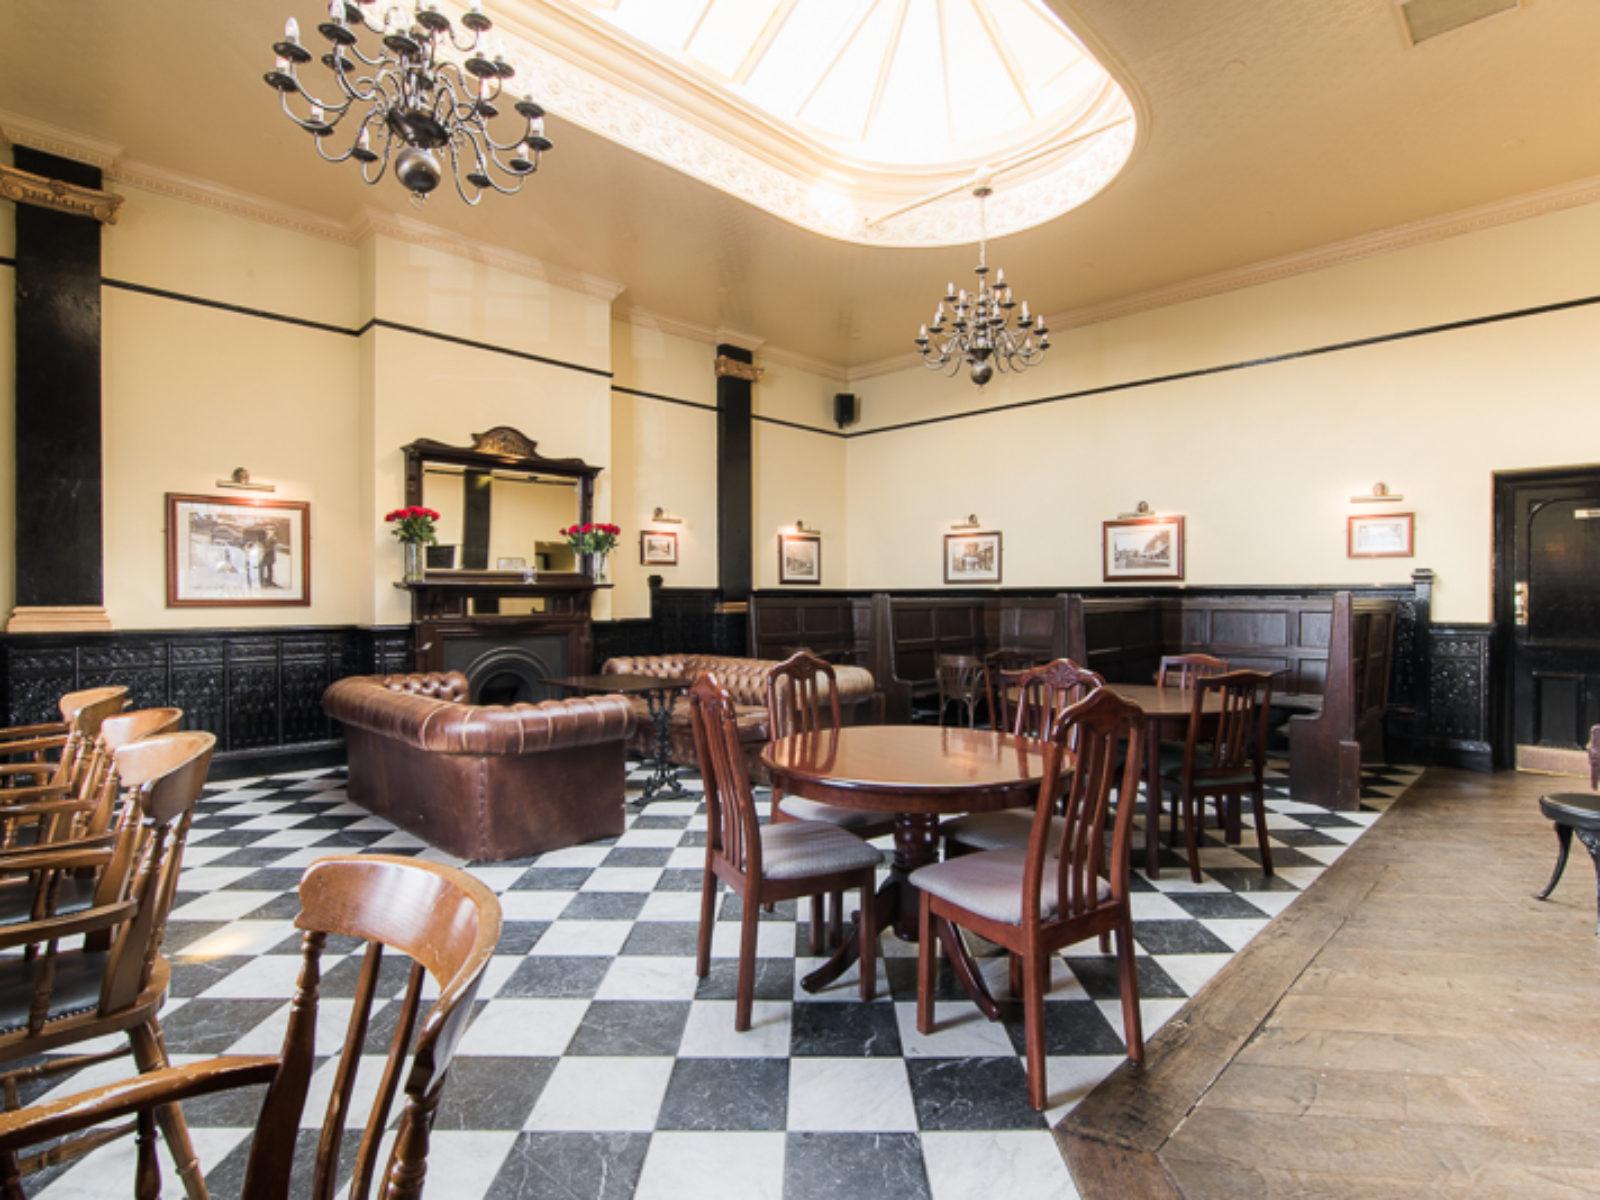 Shaftesbury Tavern Function Room